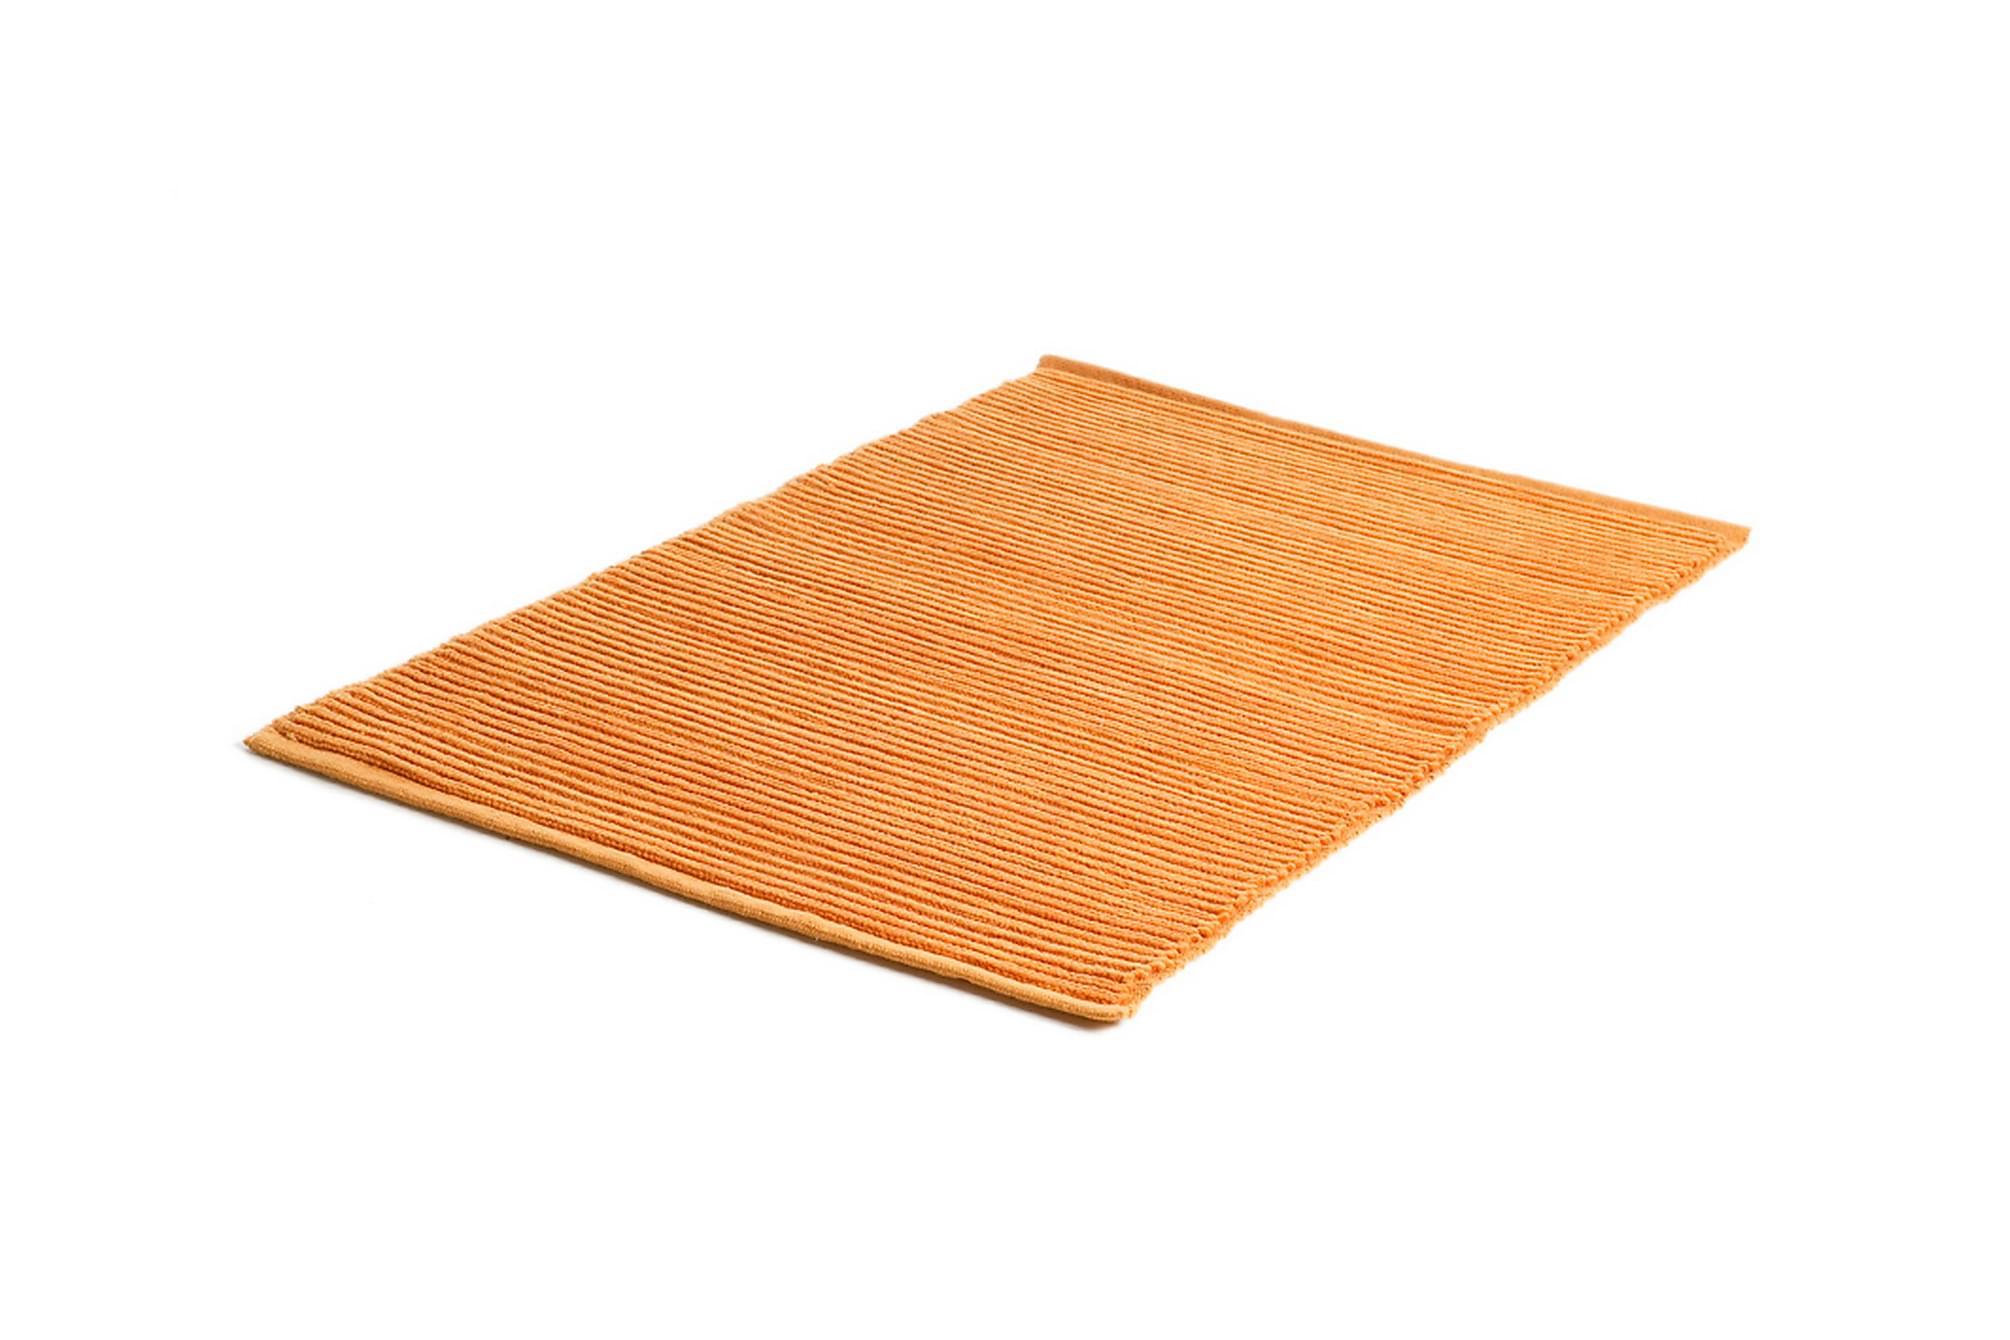 Matta ribb 60x90 cm orange for Stahlwandbecken 3 60 x 0 90